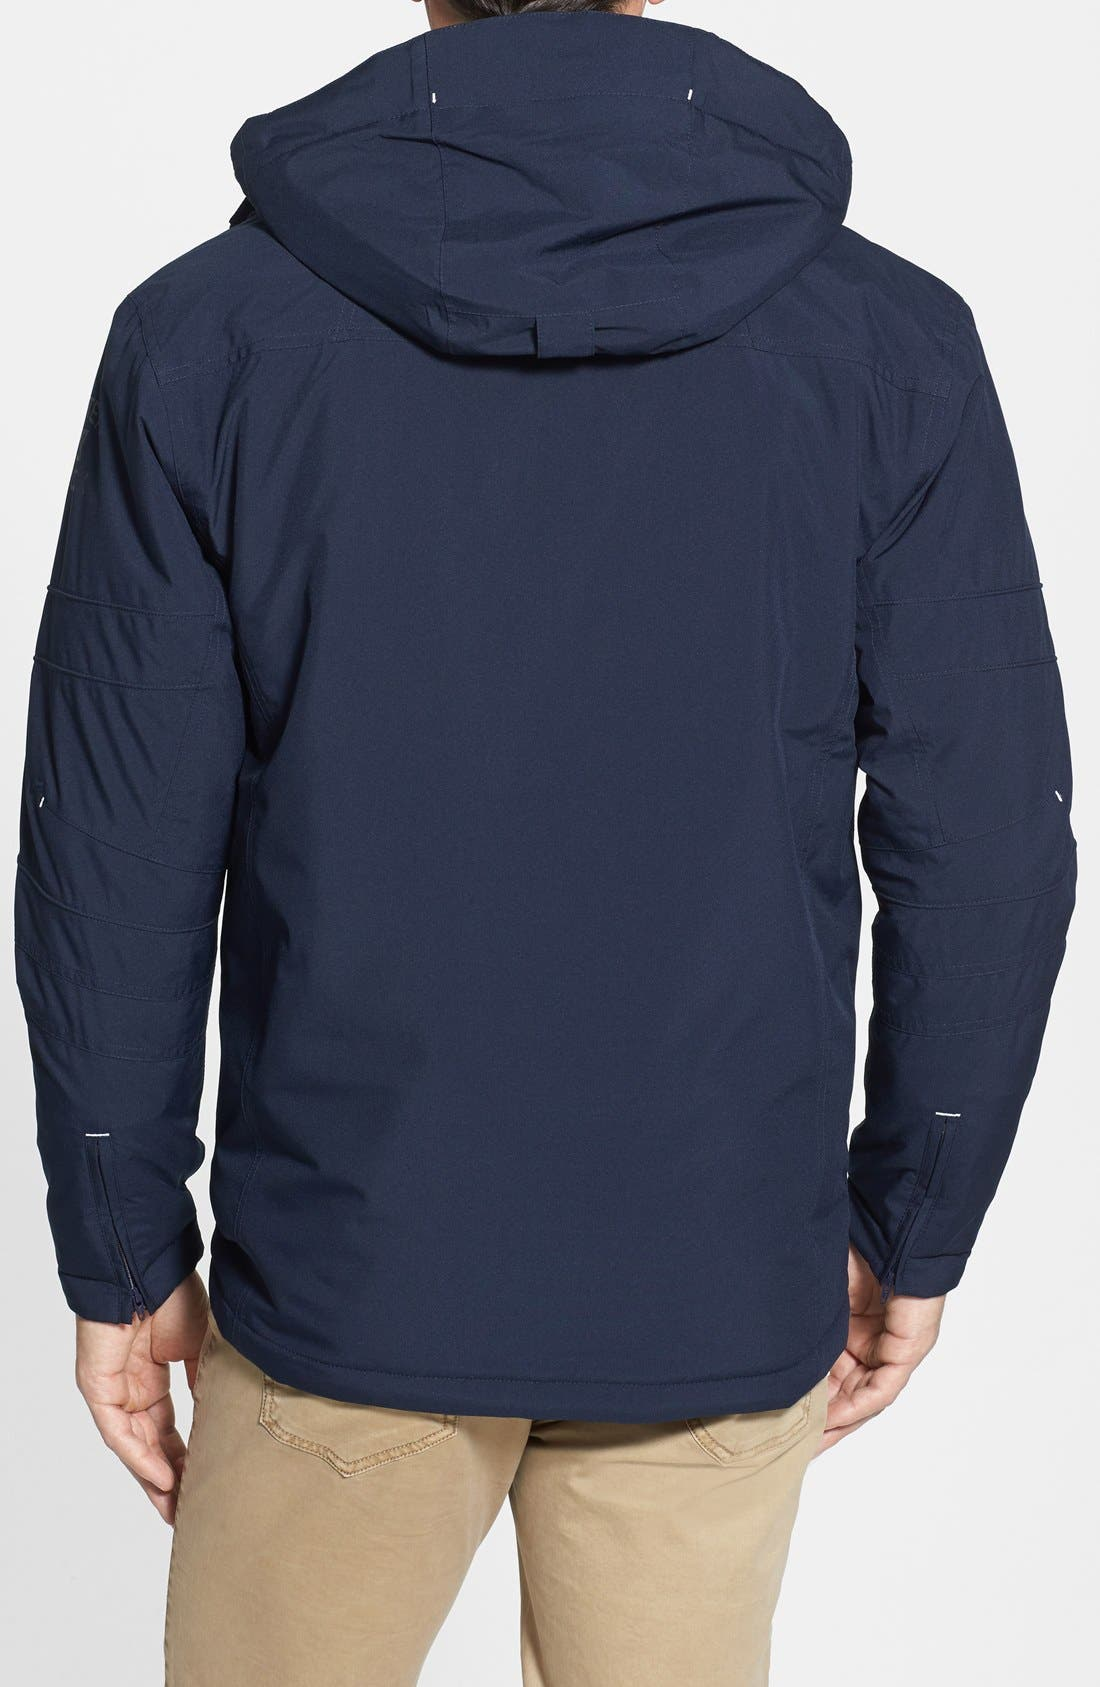 WeatherTec Sanders Jacket,                             Alternate thumbnail 2, color,                             420